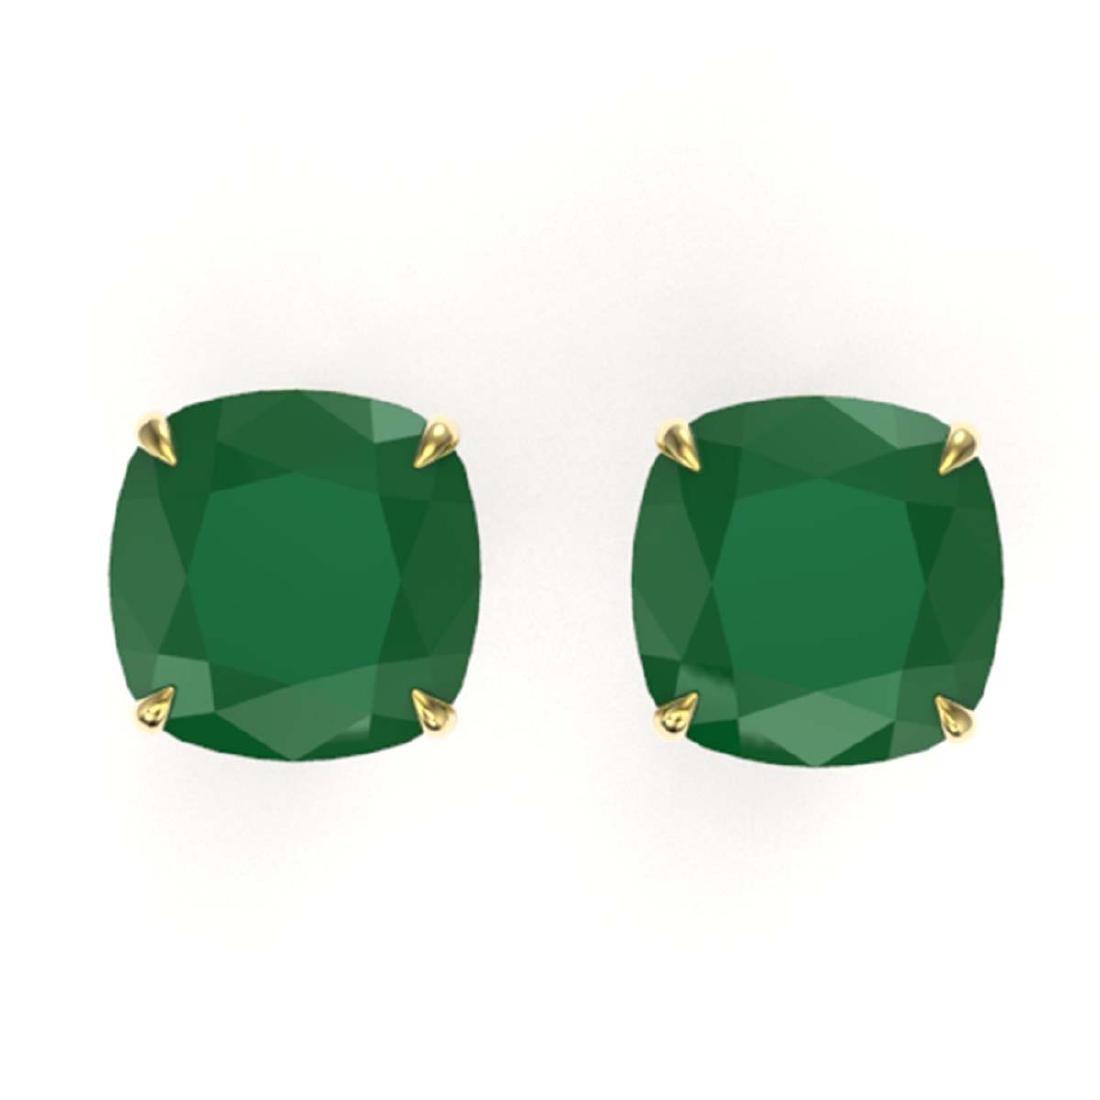 12 ctw Cushion Cut Emerald Stud Earrings 18K Yellow